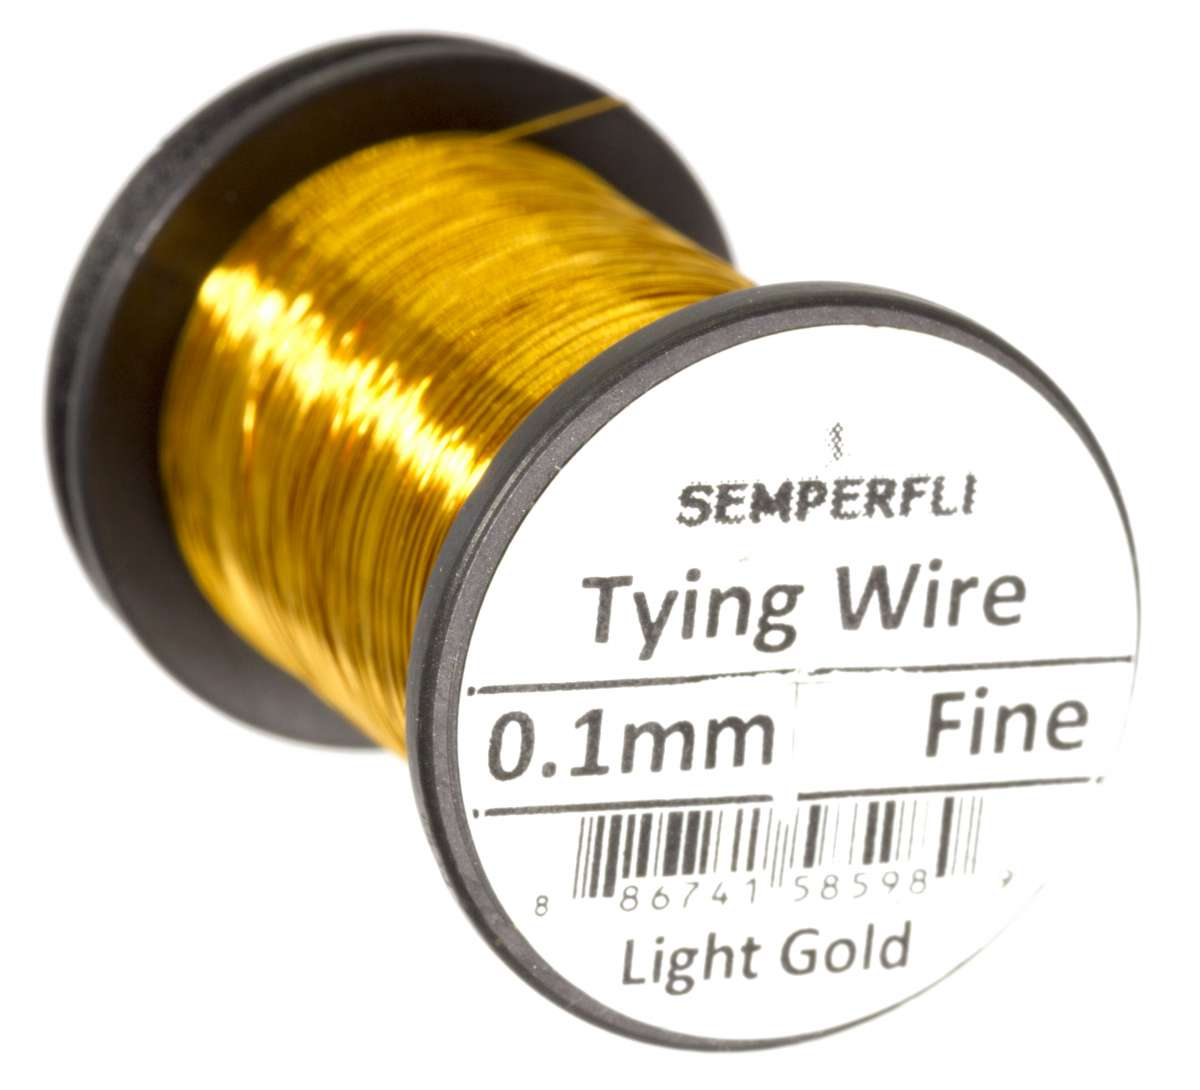 finewire light gold